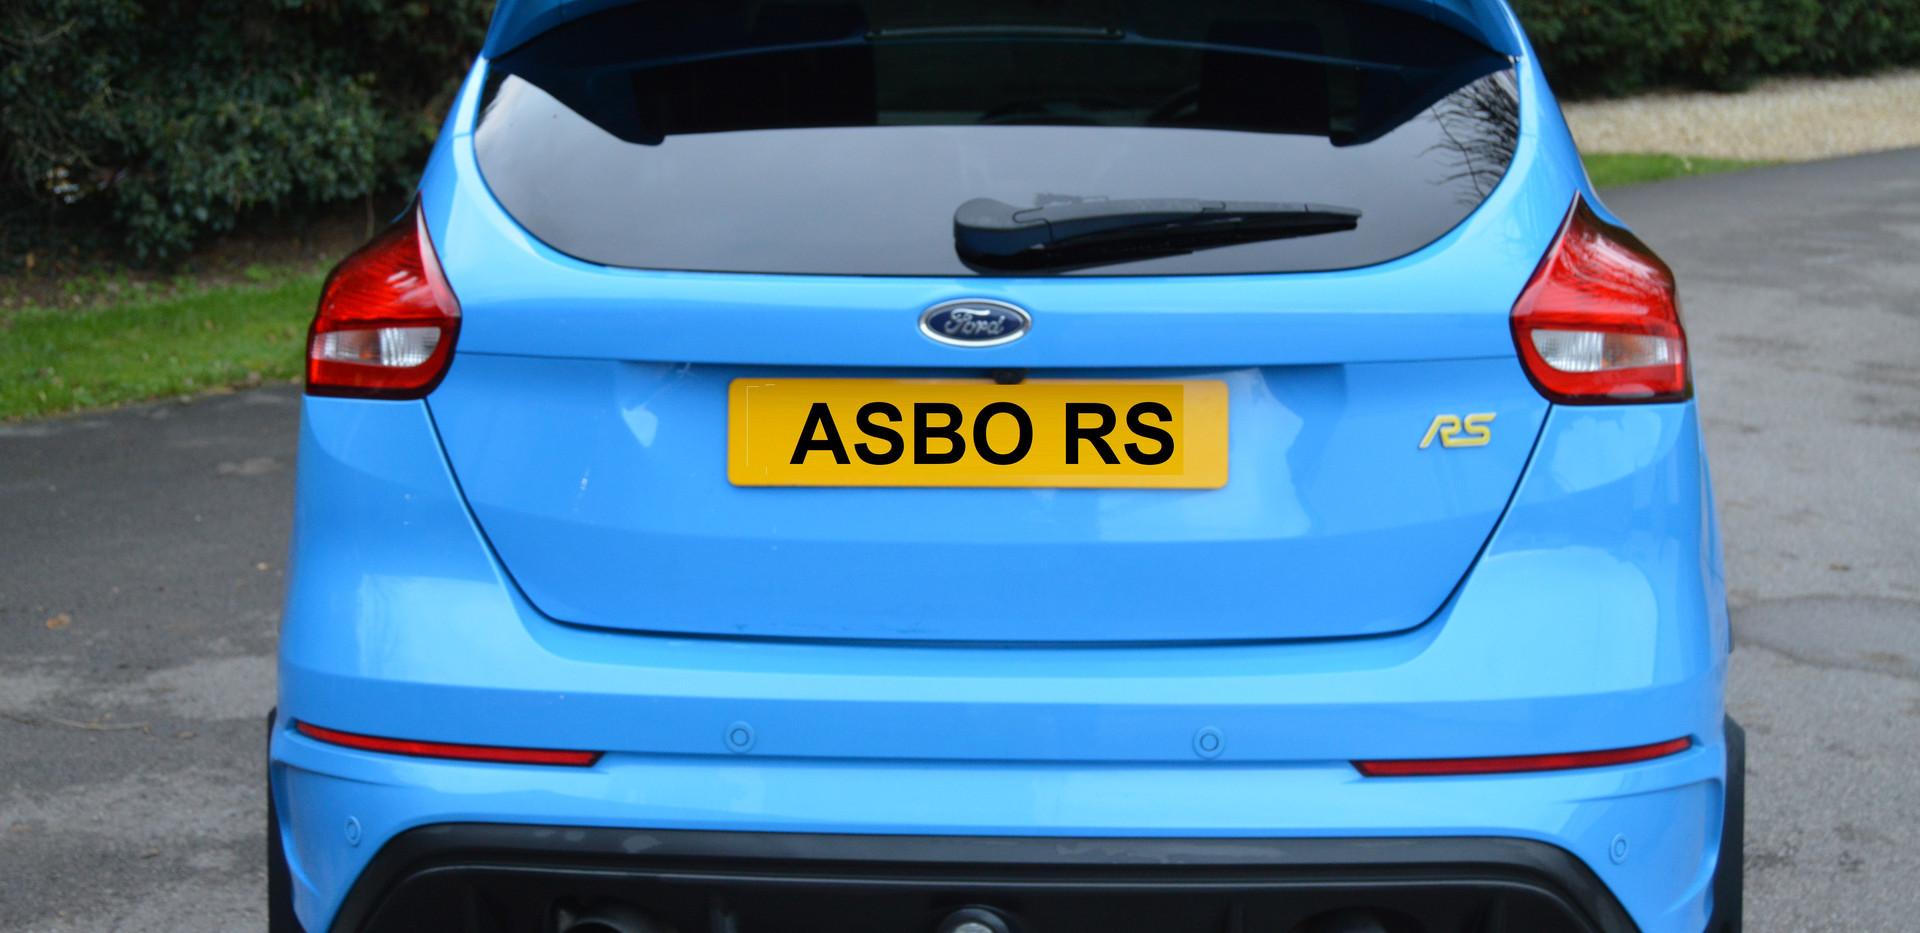 ASBO RS REAR.jpg